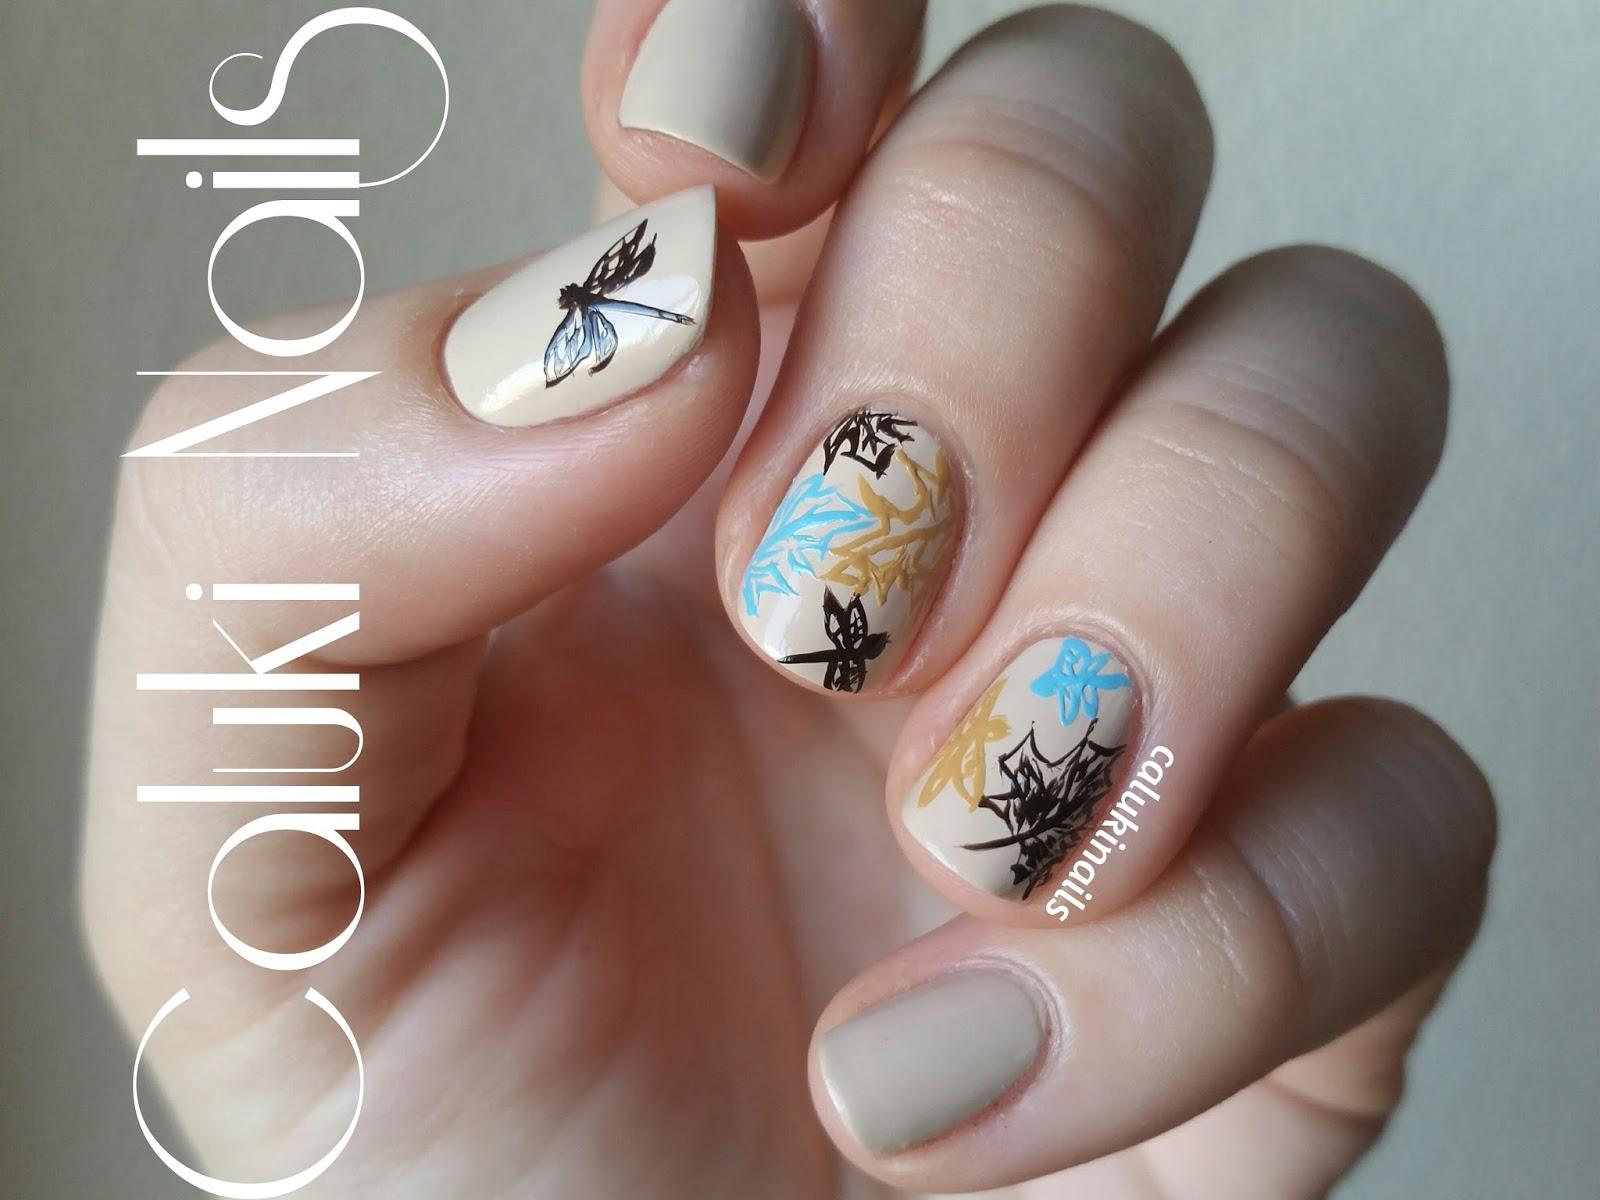 Caluki Nails Nail Art Hojas Y Libélulas De Otoño